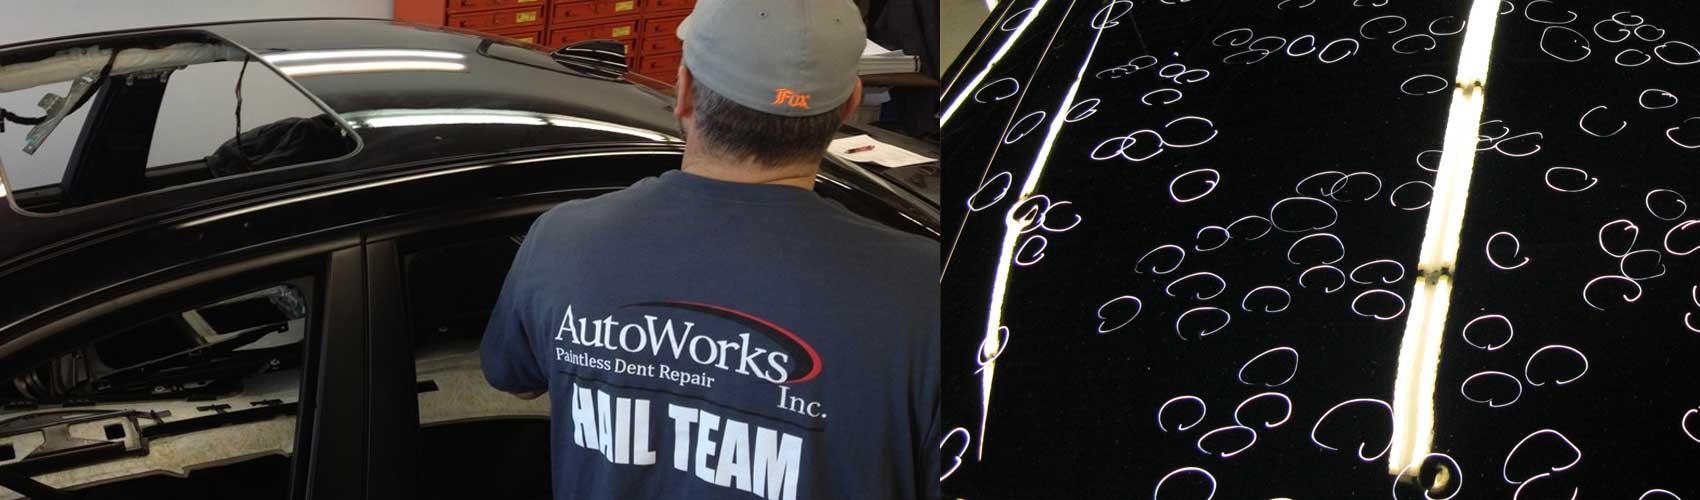 Auto Works Paintless Dent Repair image 2